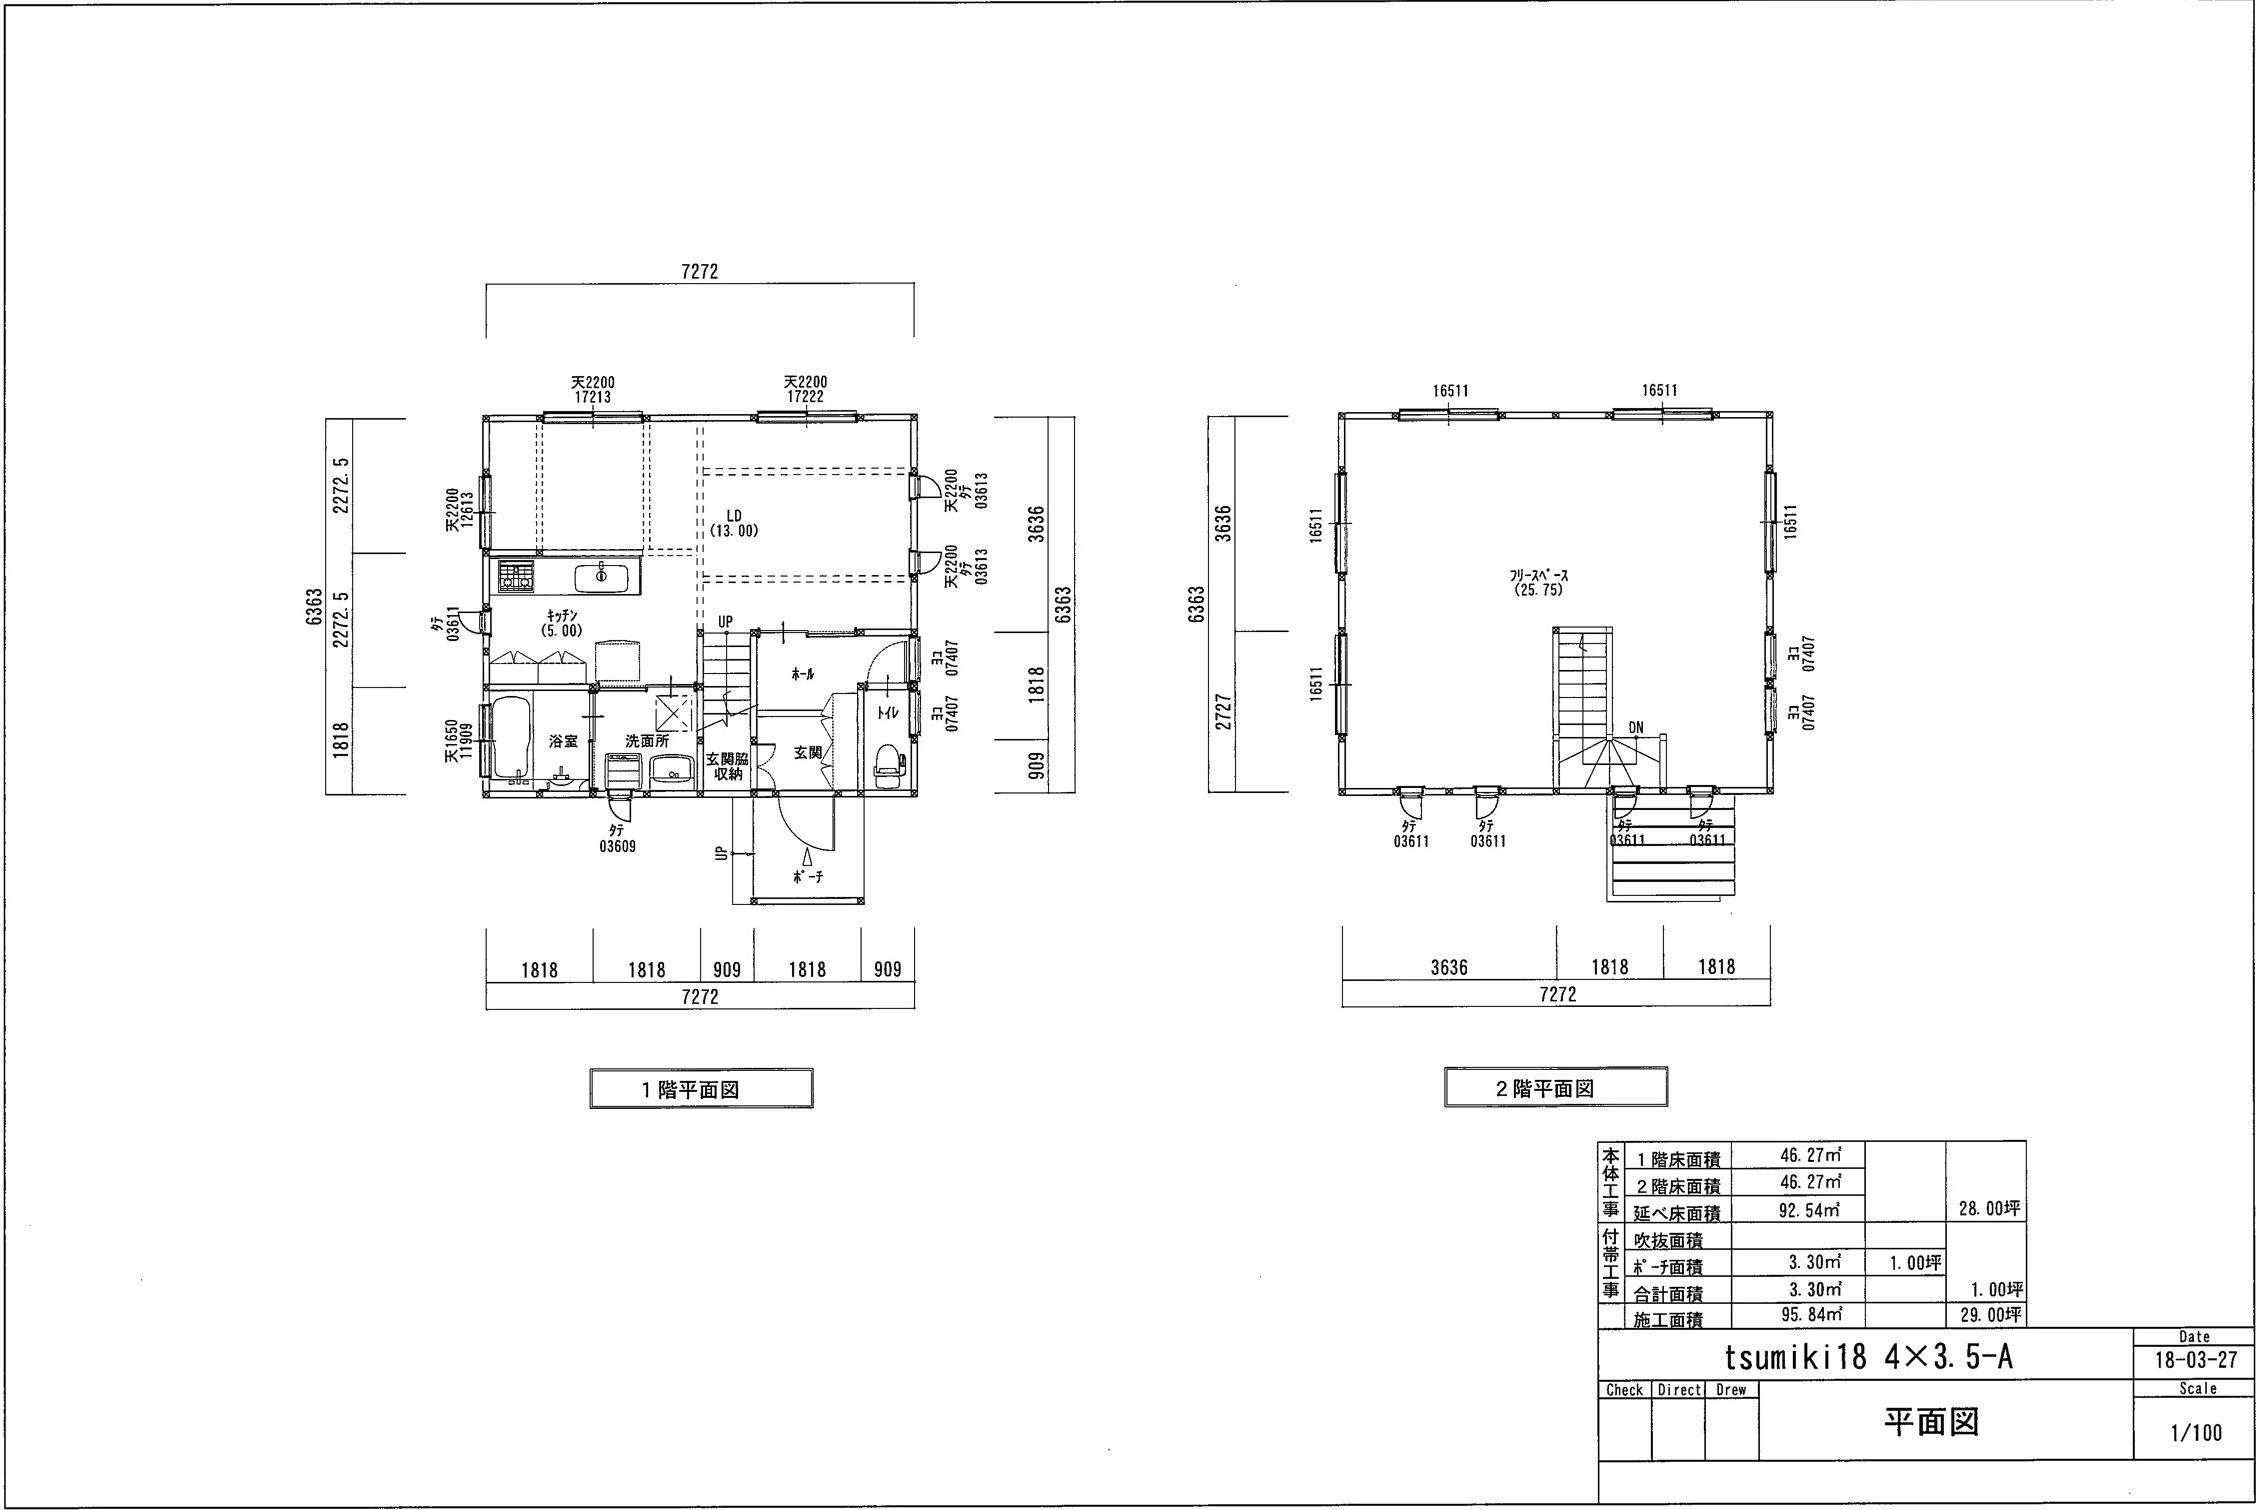 tsumiki 29坪 (4×3.5-A):画像